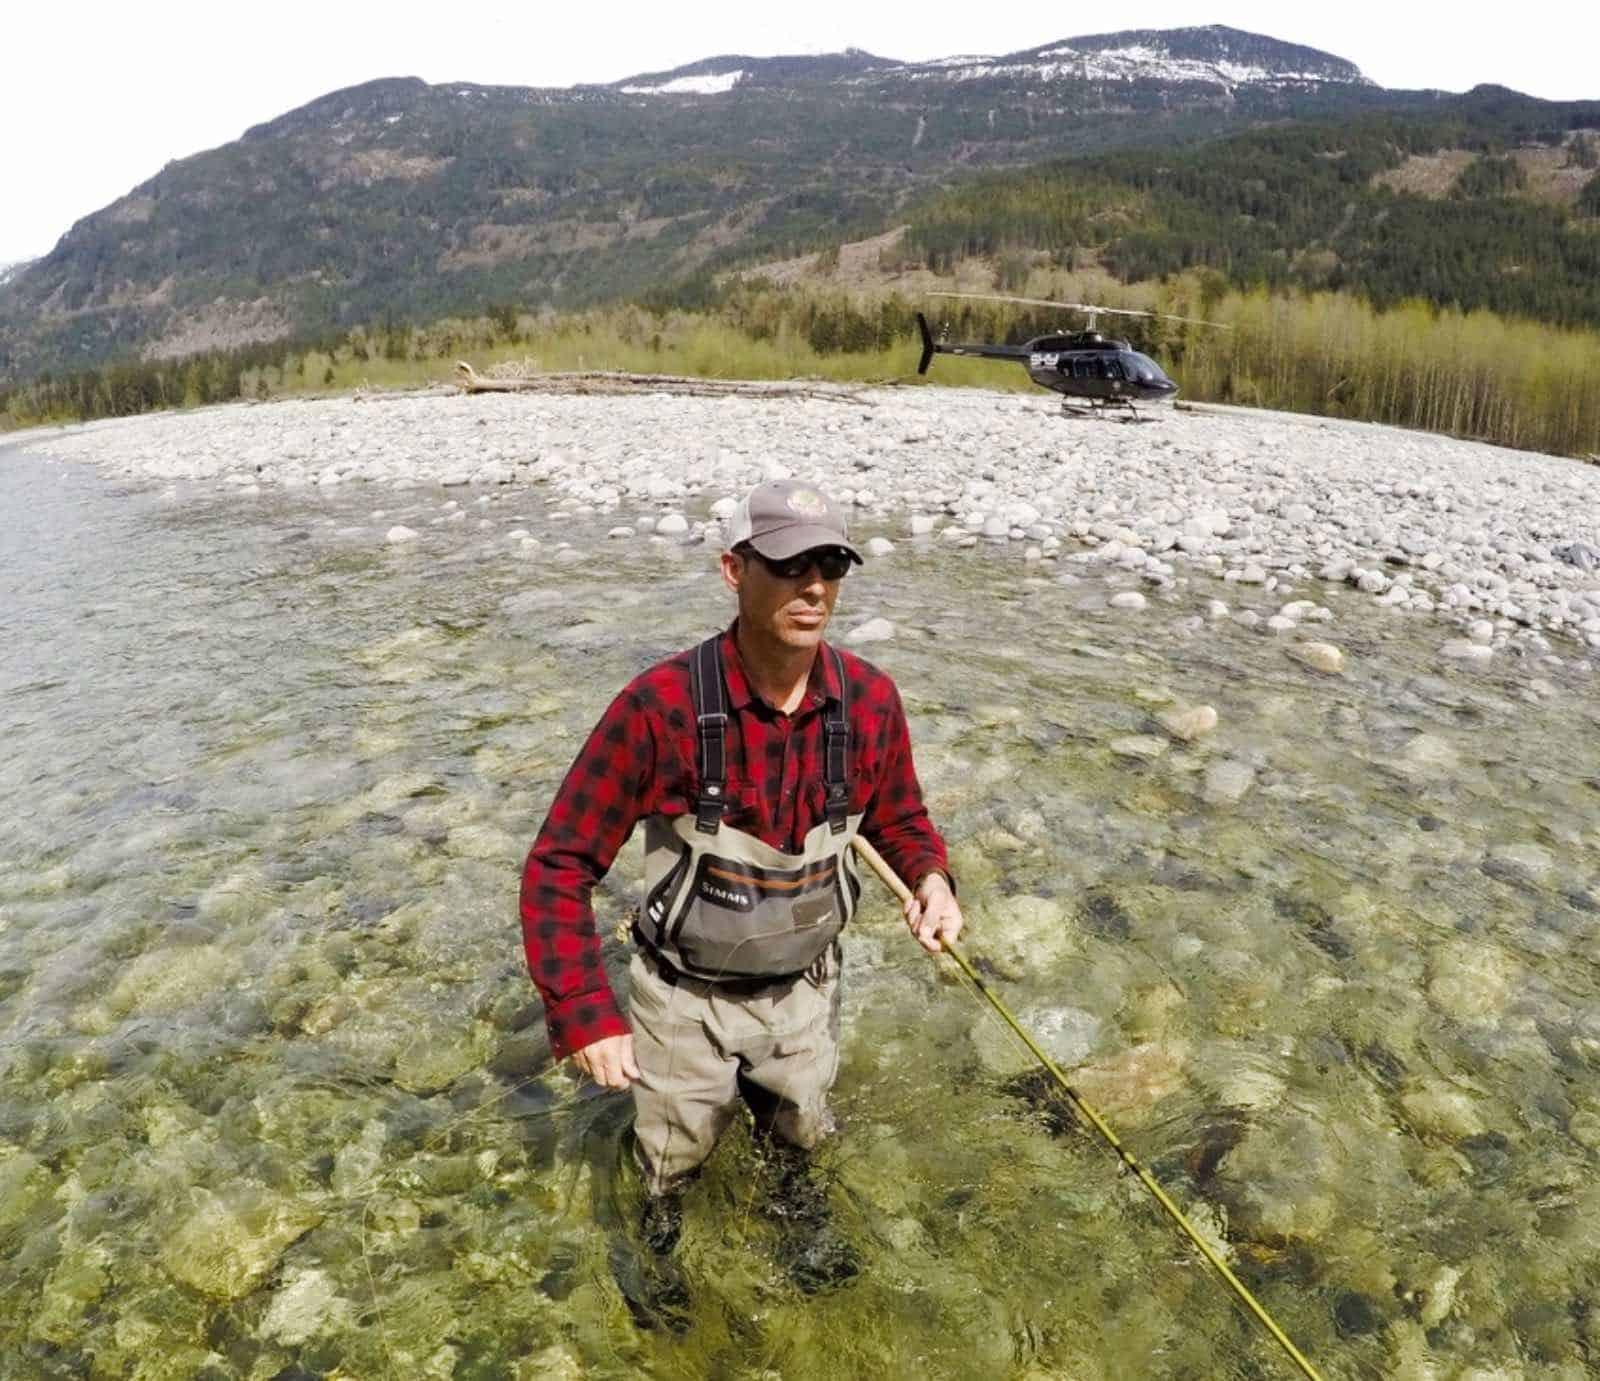 Heli Fishing Pitt River BC